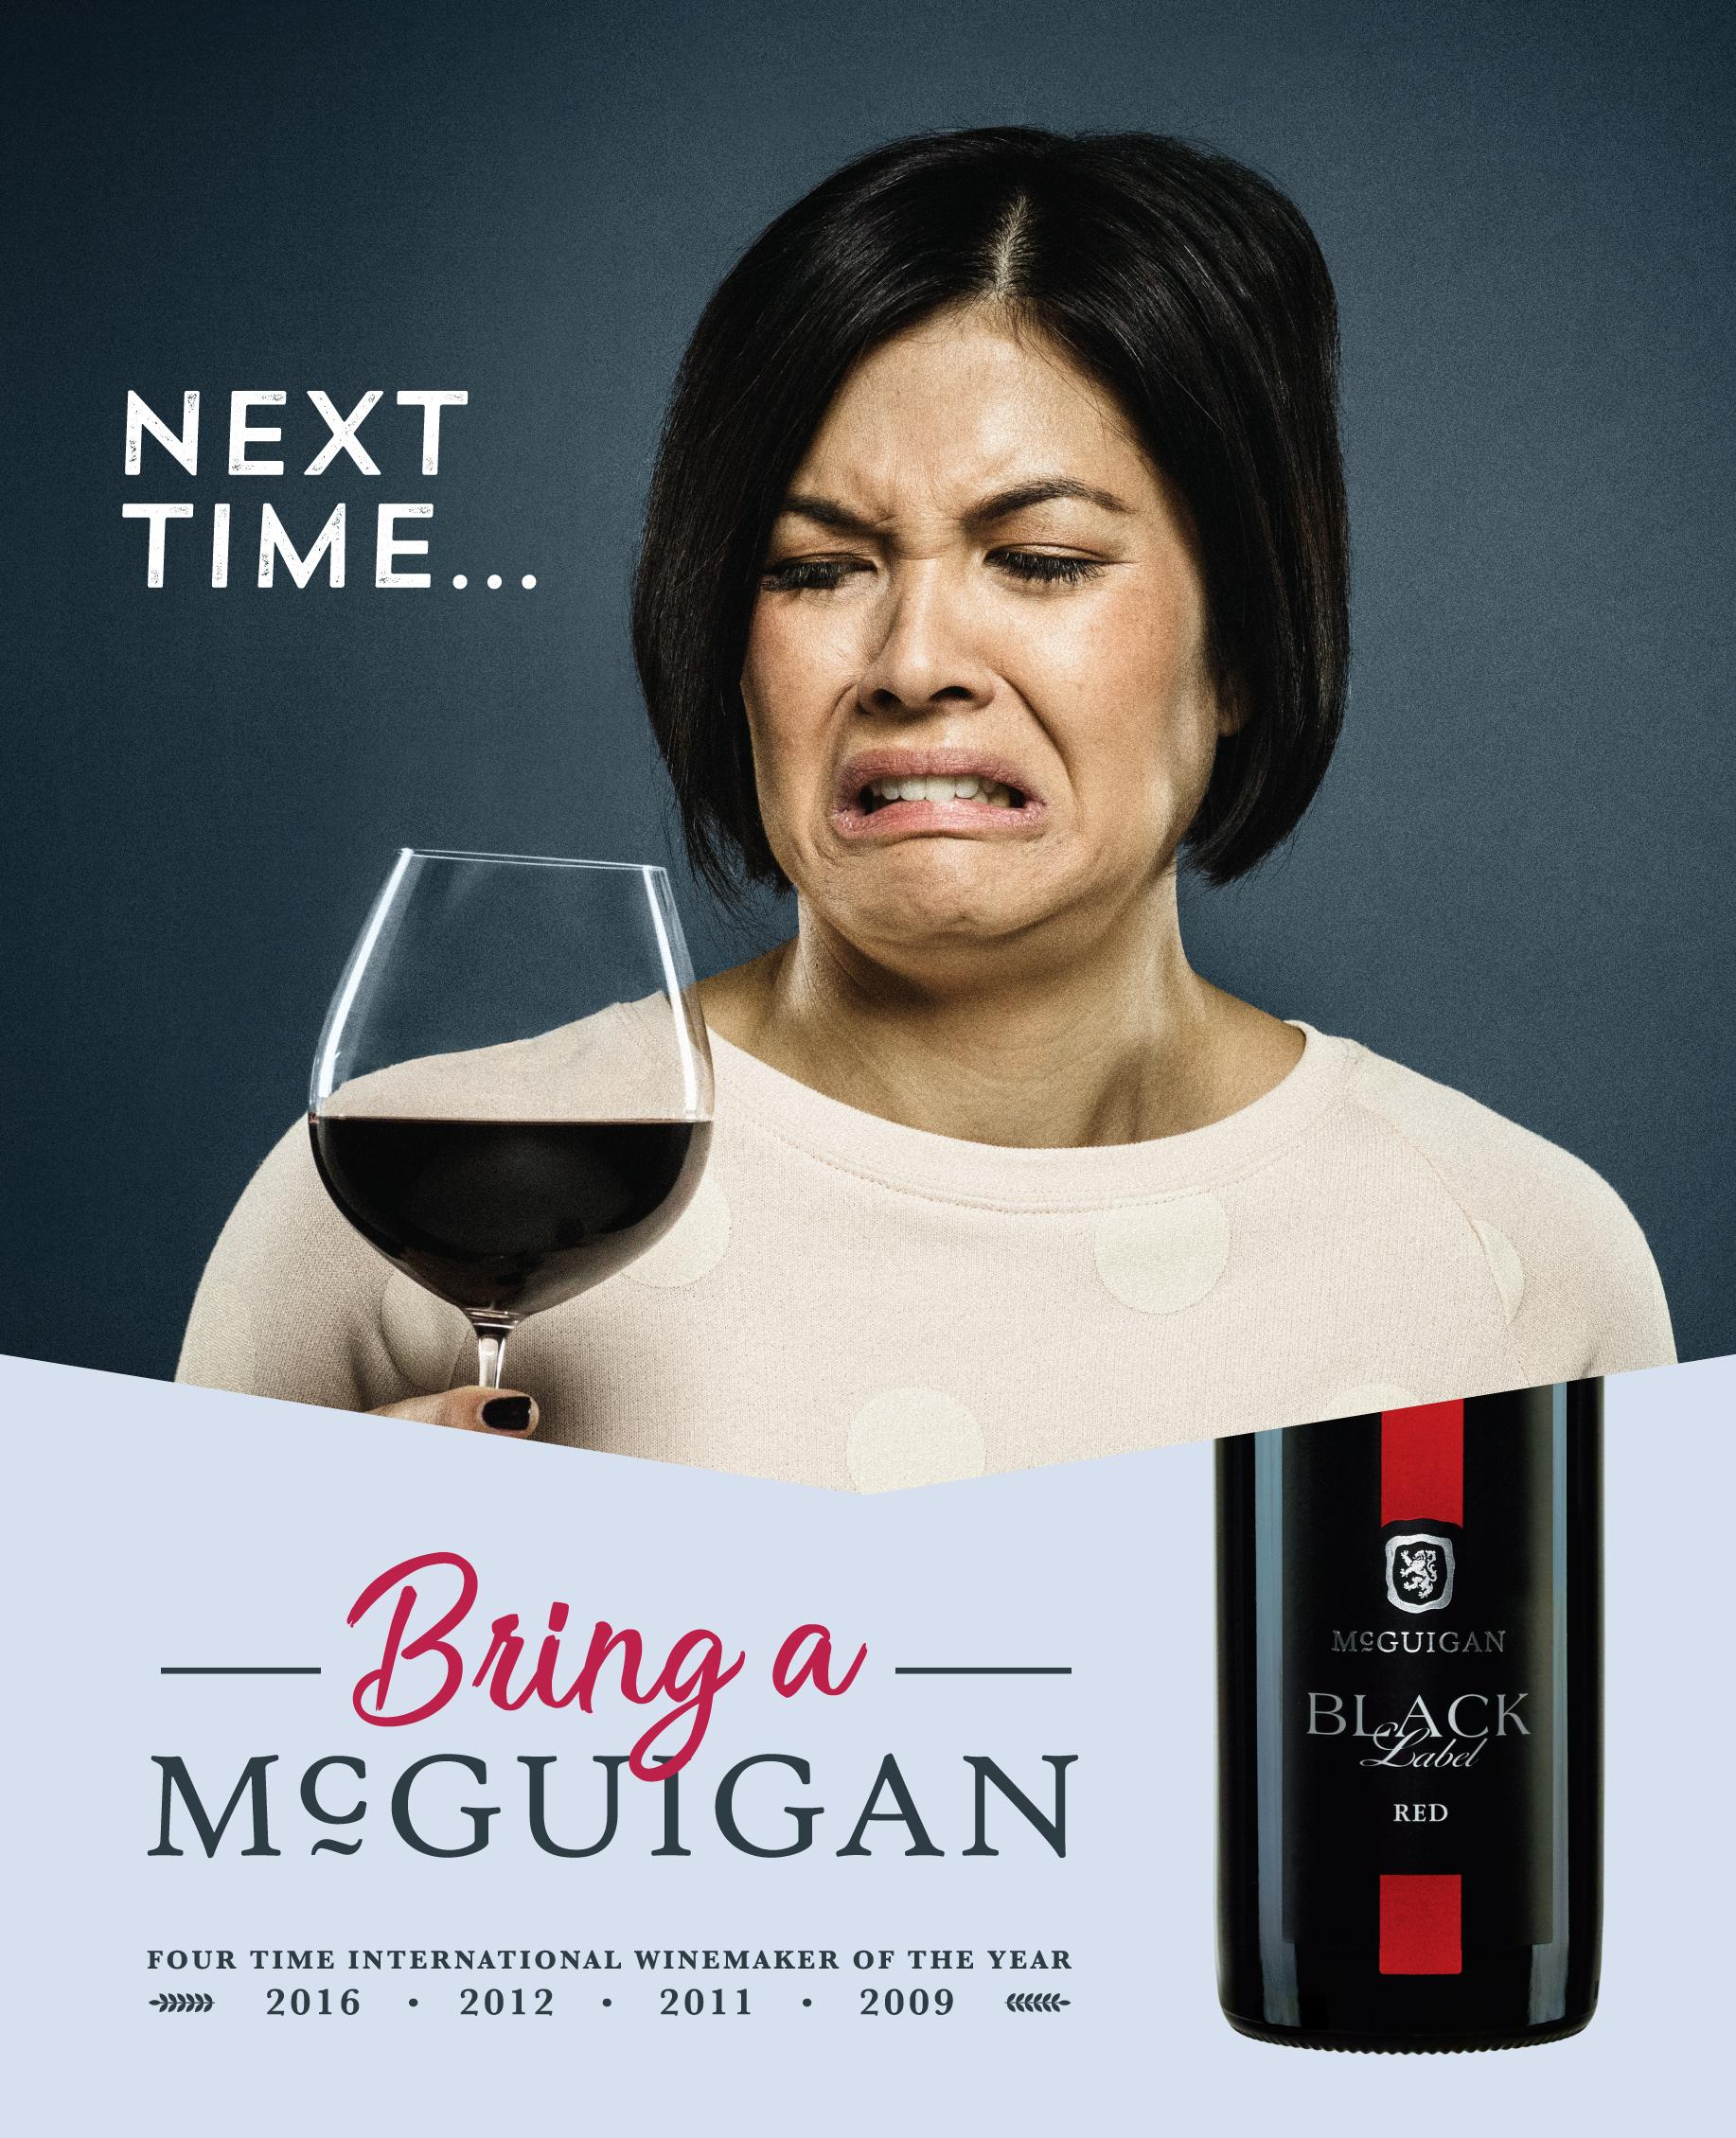 McGuigan Wines Print Ad - Awkward Moments, 2